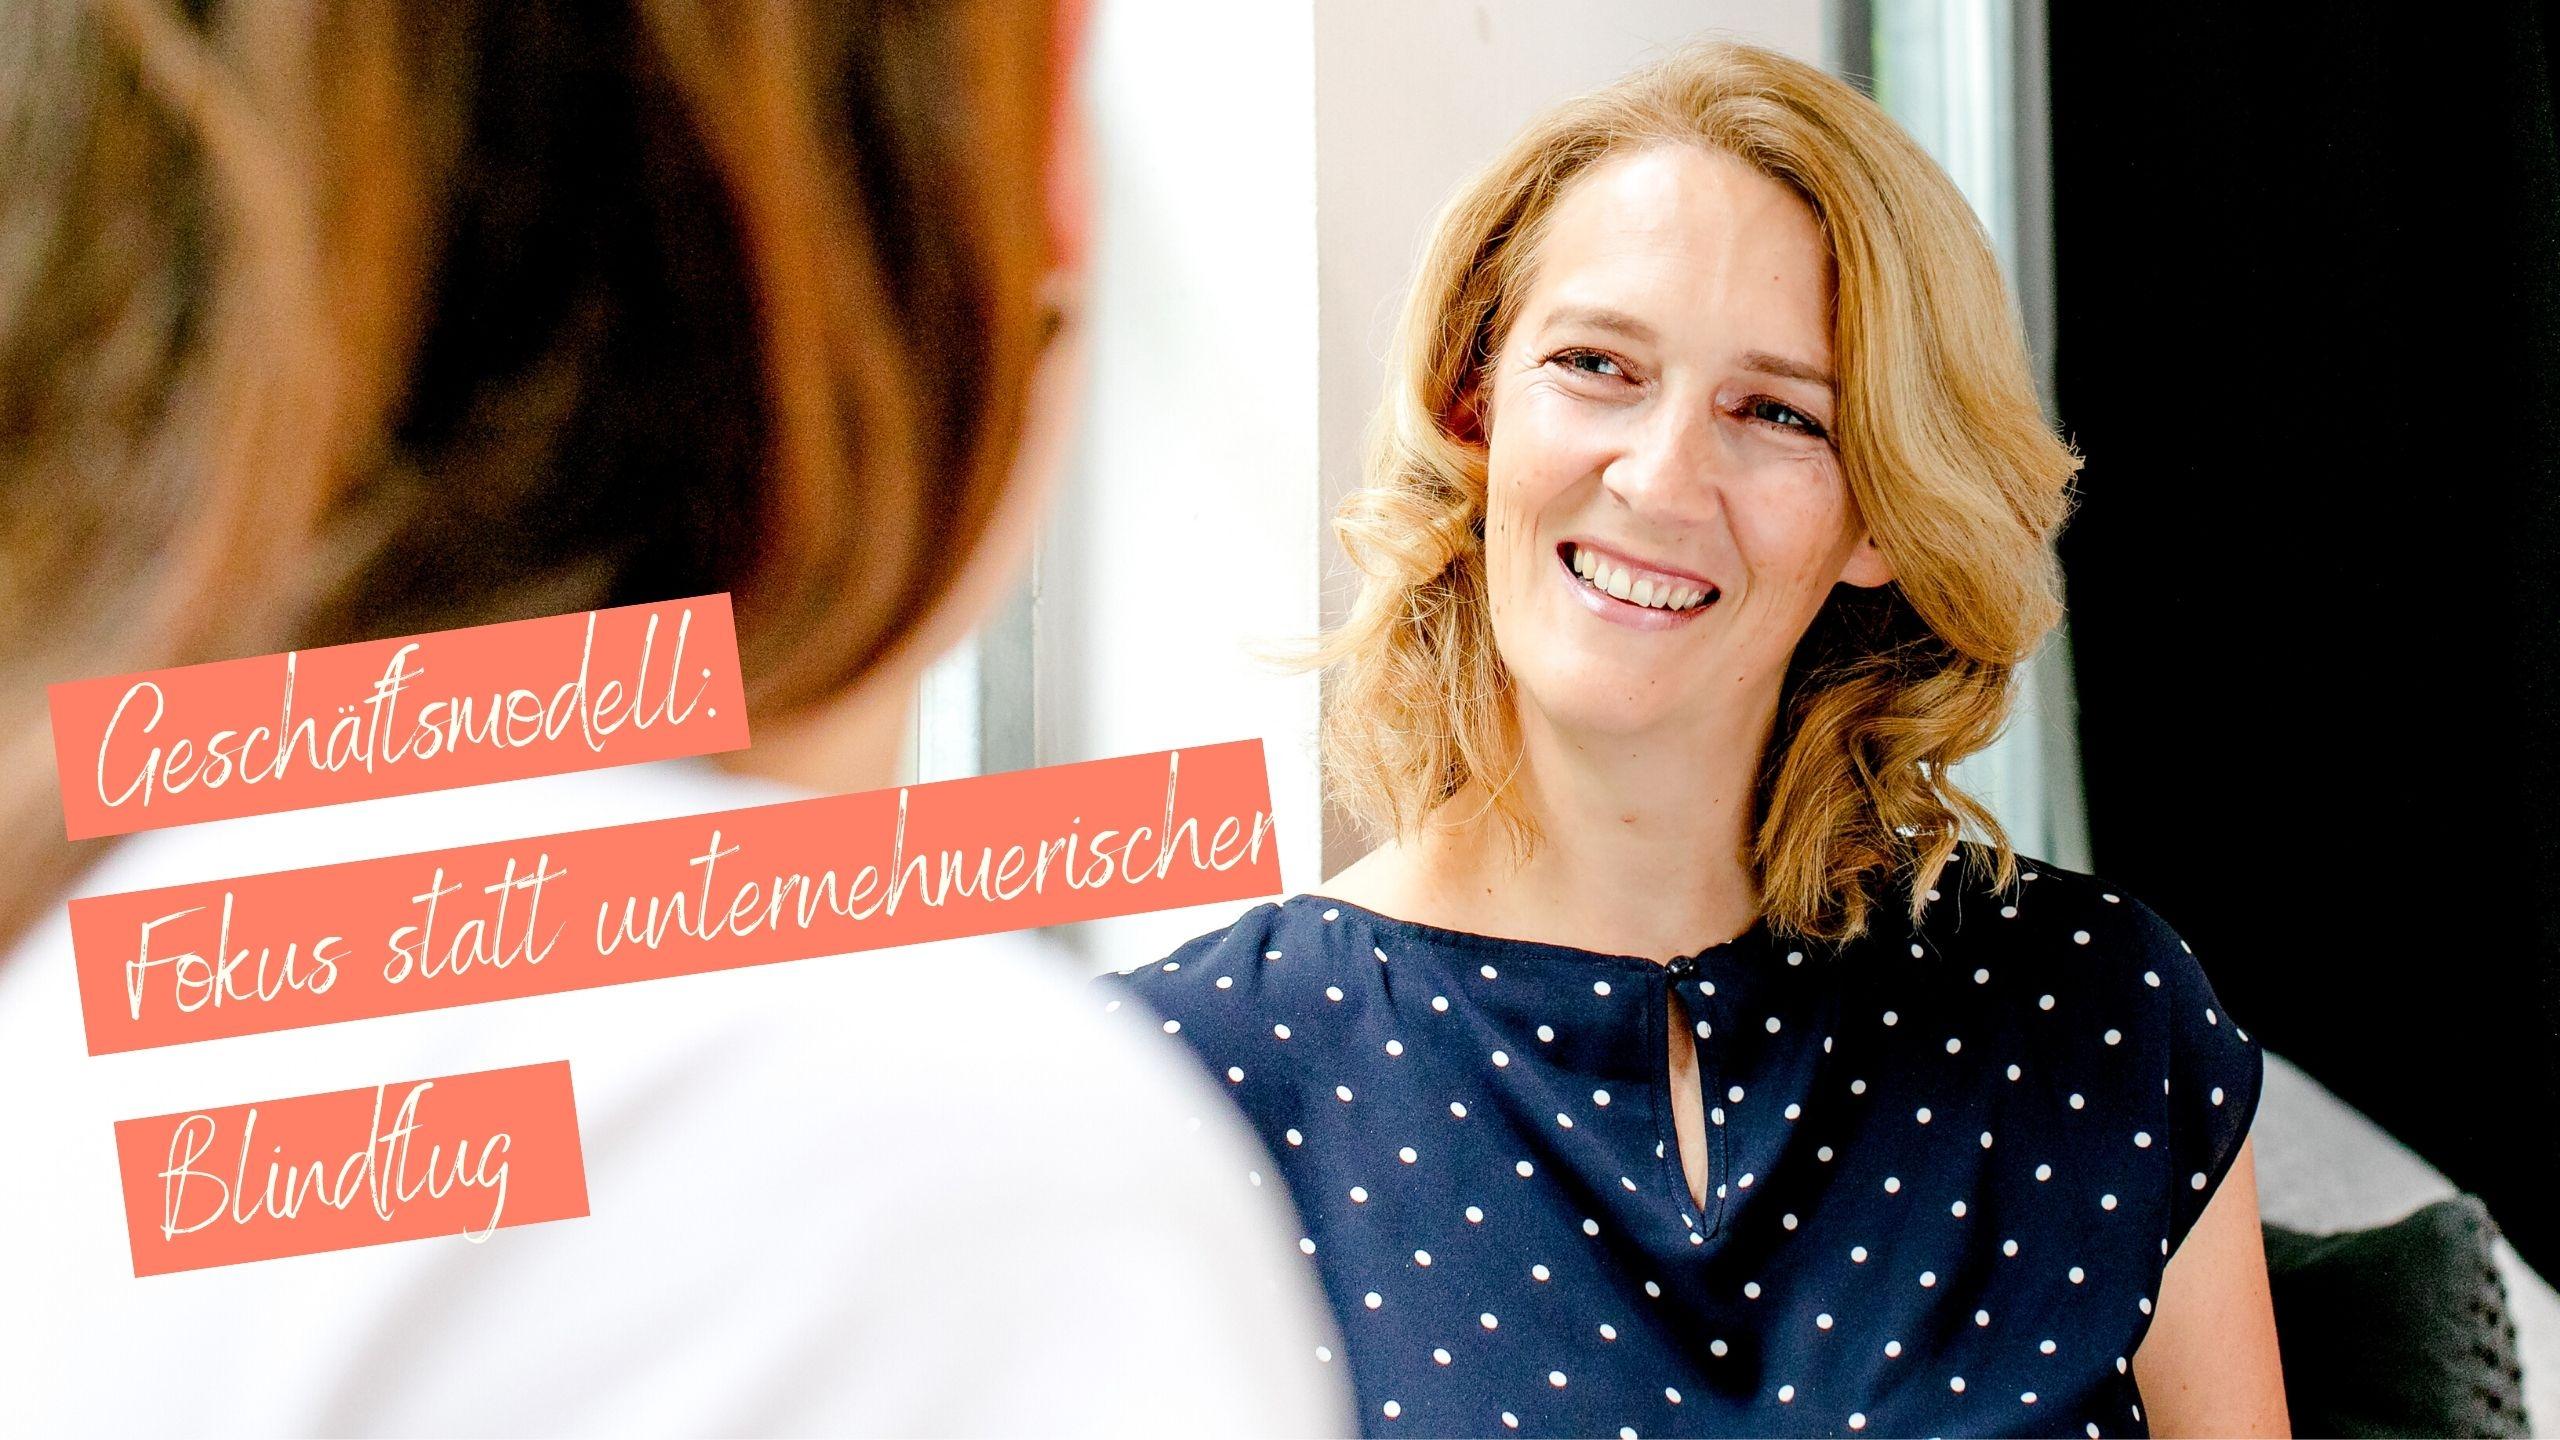 Michaela Schächner-geiler gründen Business Mentorin_geiler gründen-Geschäftsmodell unternehmerischer Blindflug